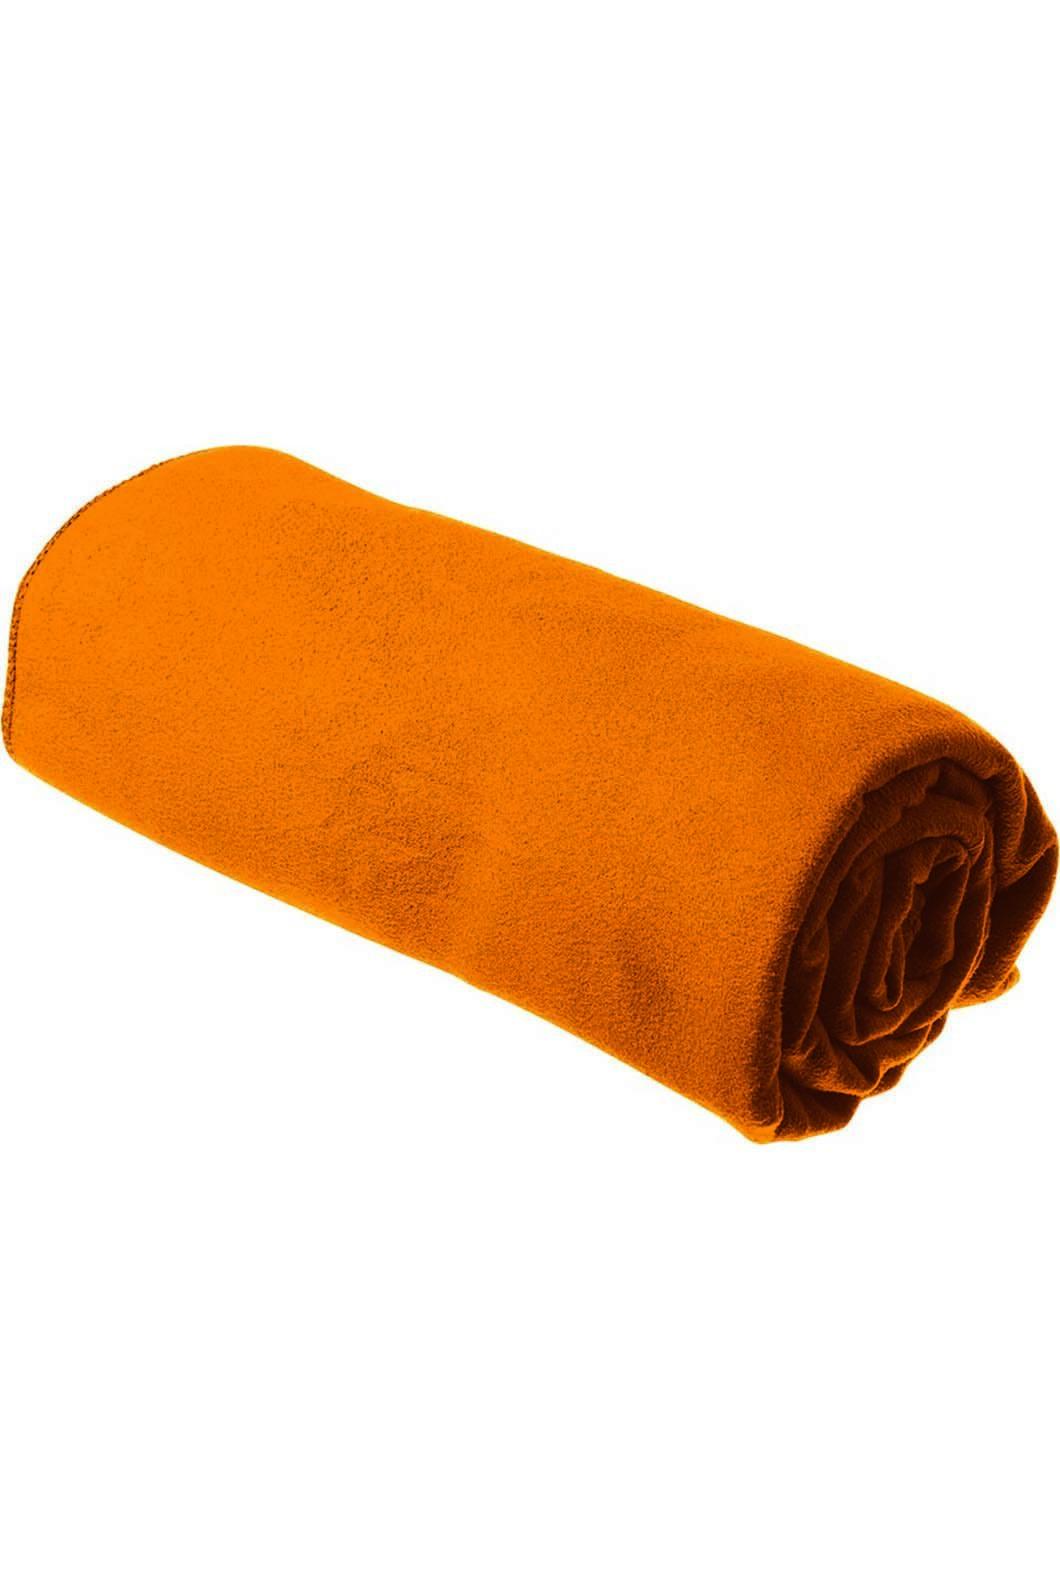 Sea to Summit Drylite Towel  S, None, hi-res